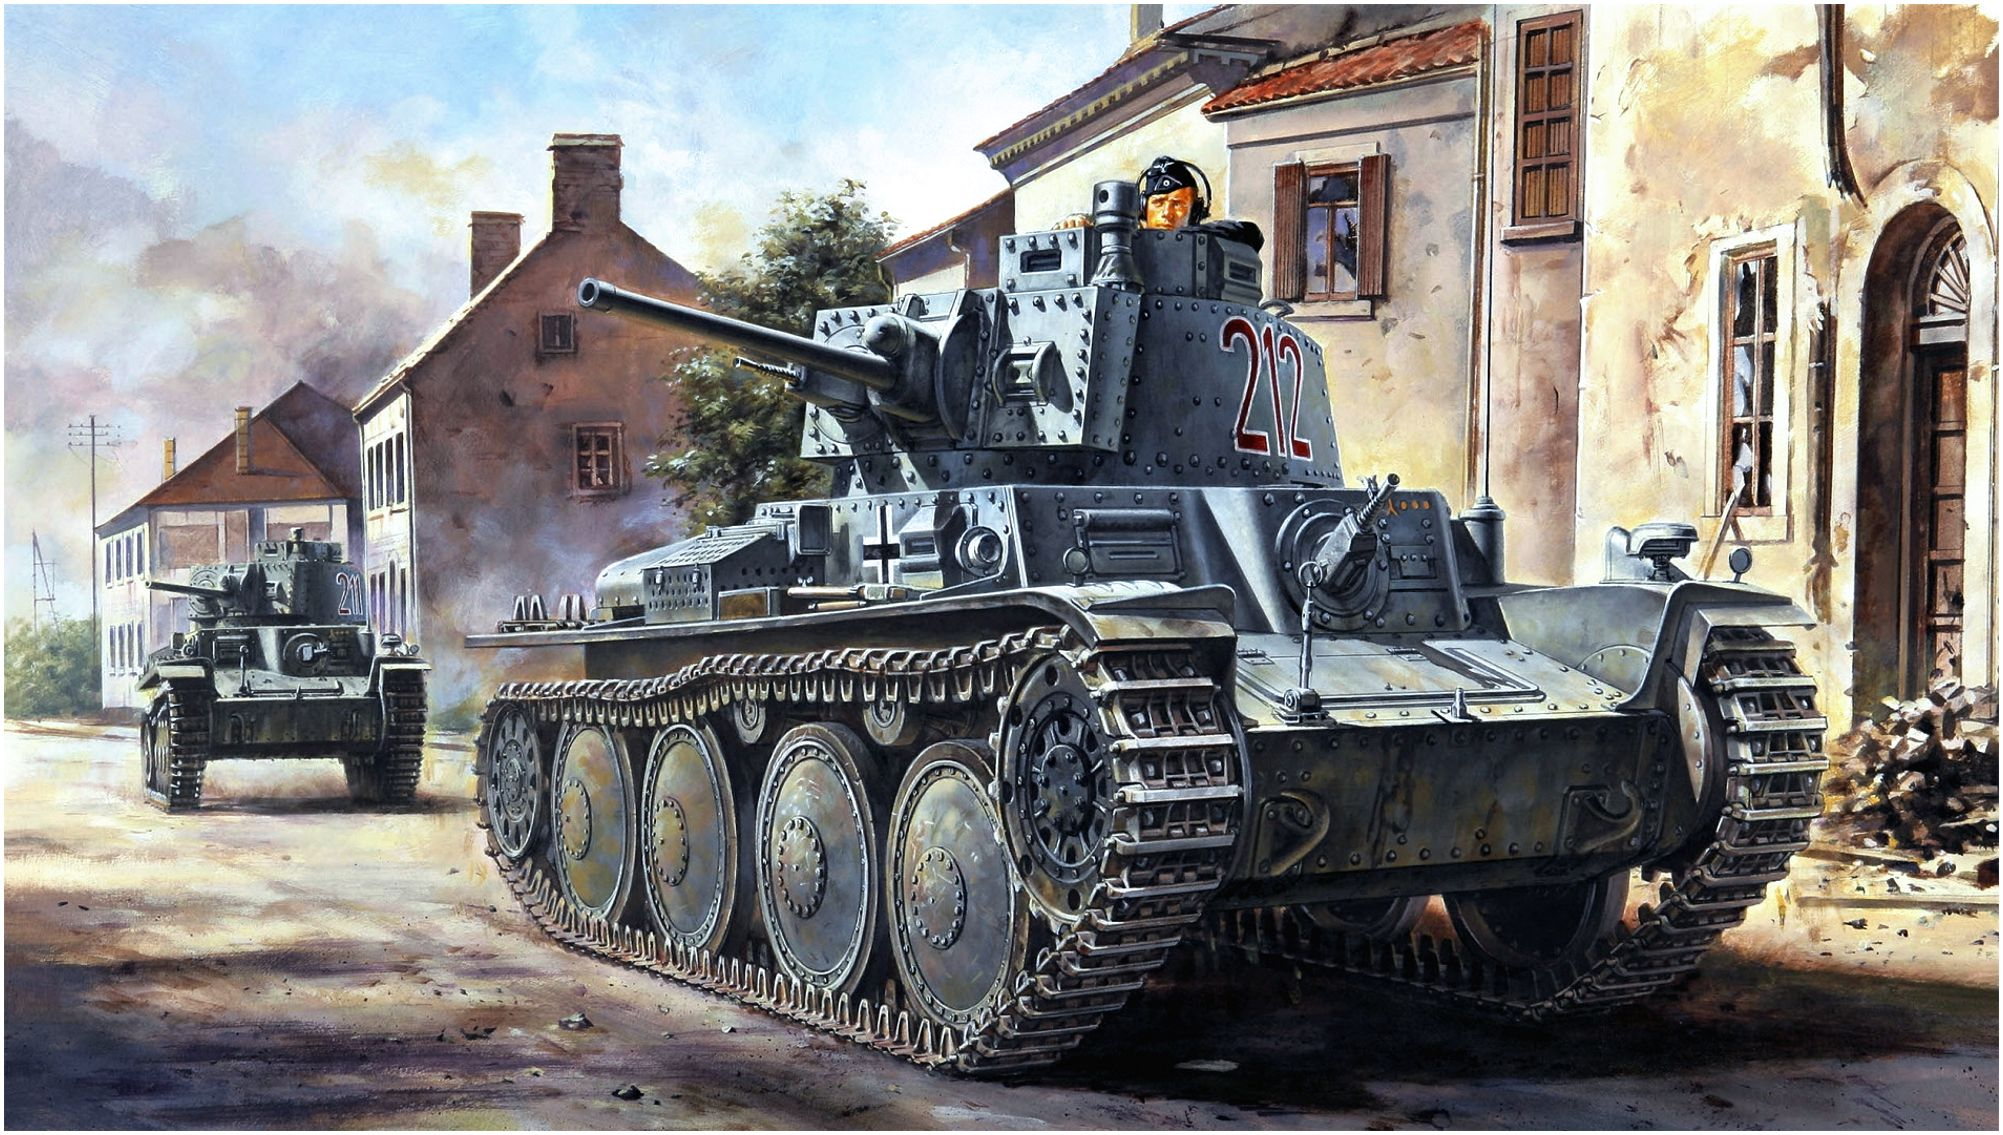 Onishi Masami. Немецкие танки в городе.